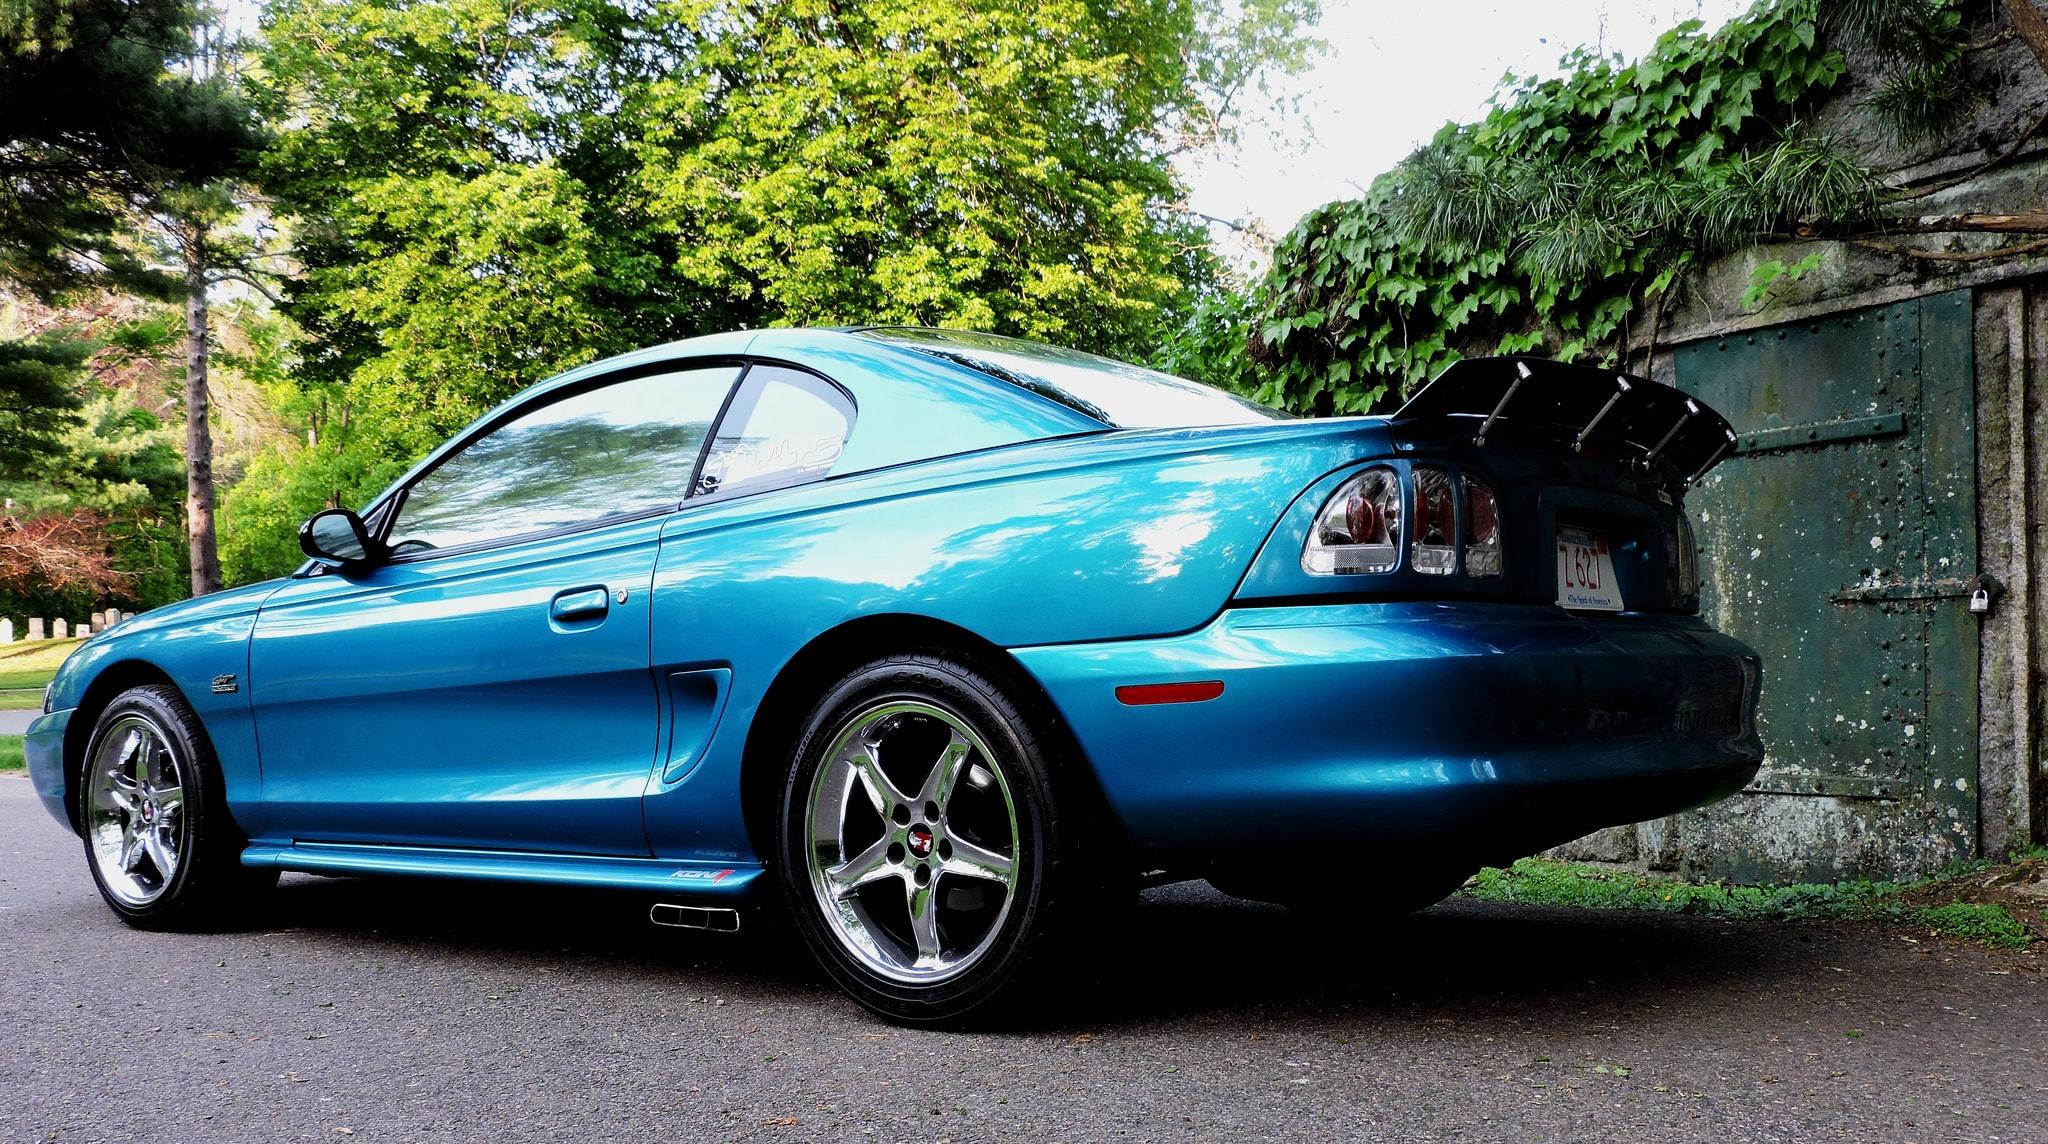 Doug Reinbold - No Attleboro, MA - 1994 Ford Mustang